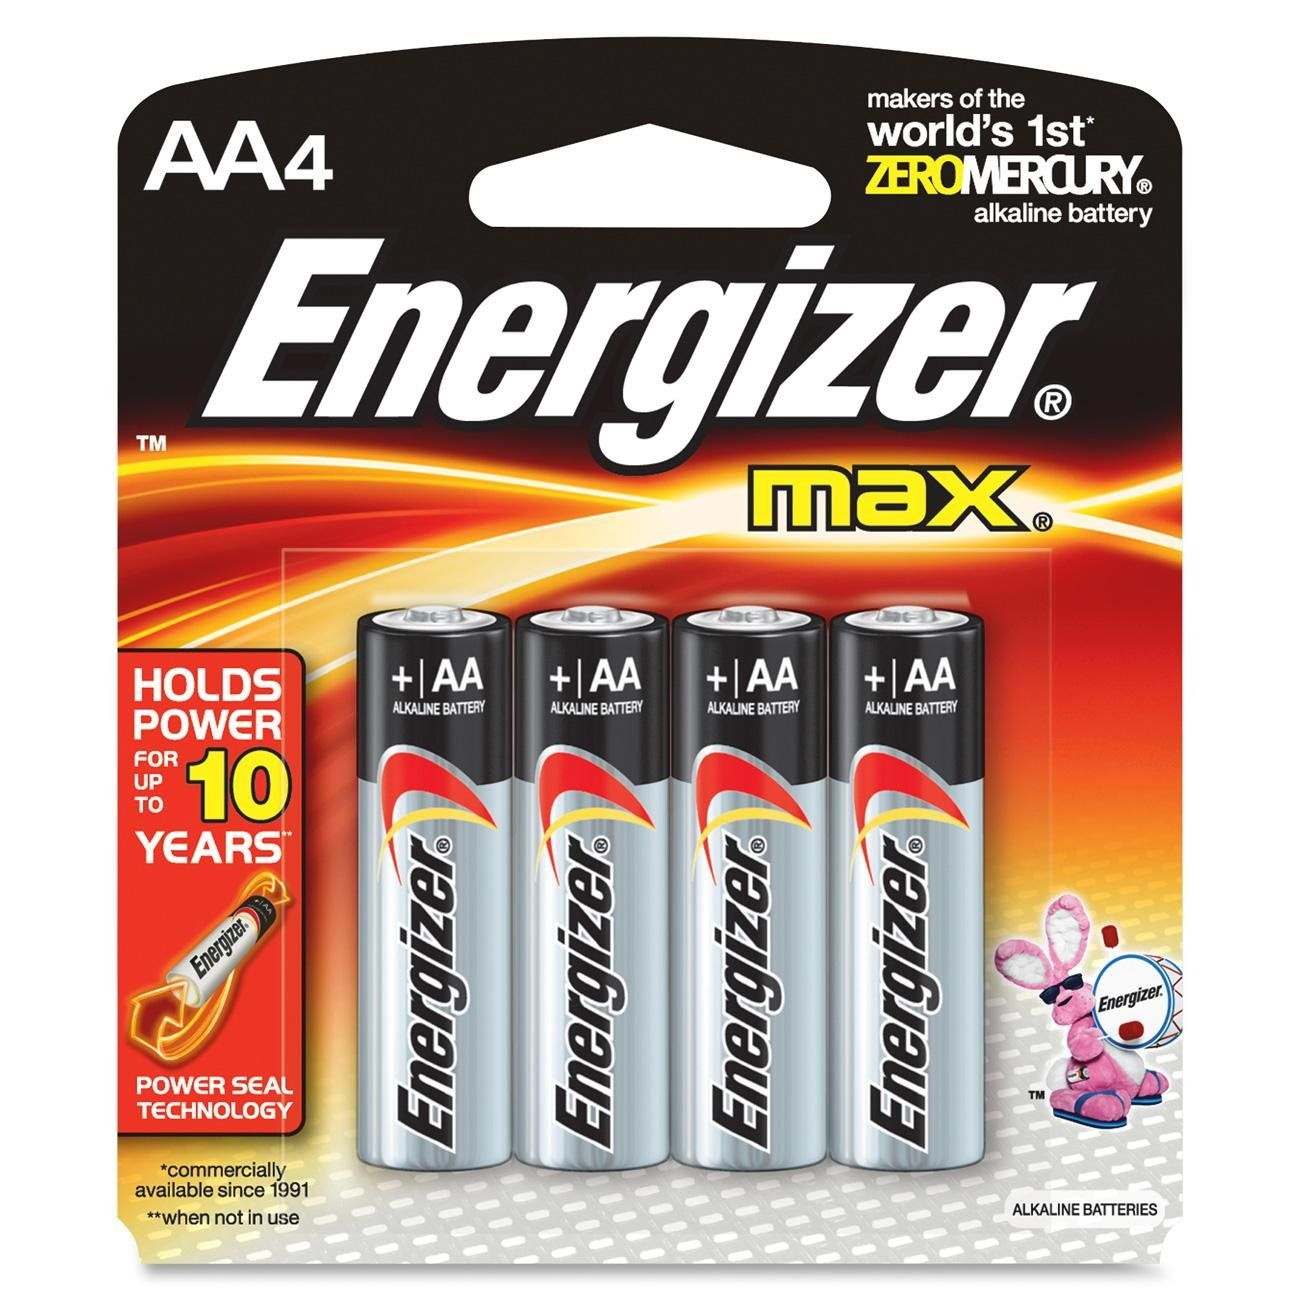 4 Pk, AA Energizer Max Battery Energizer battery